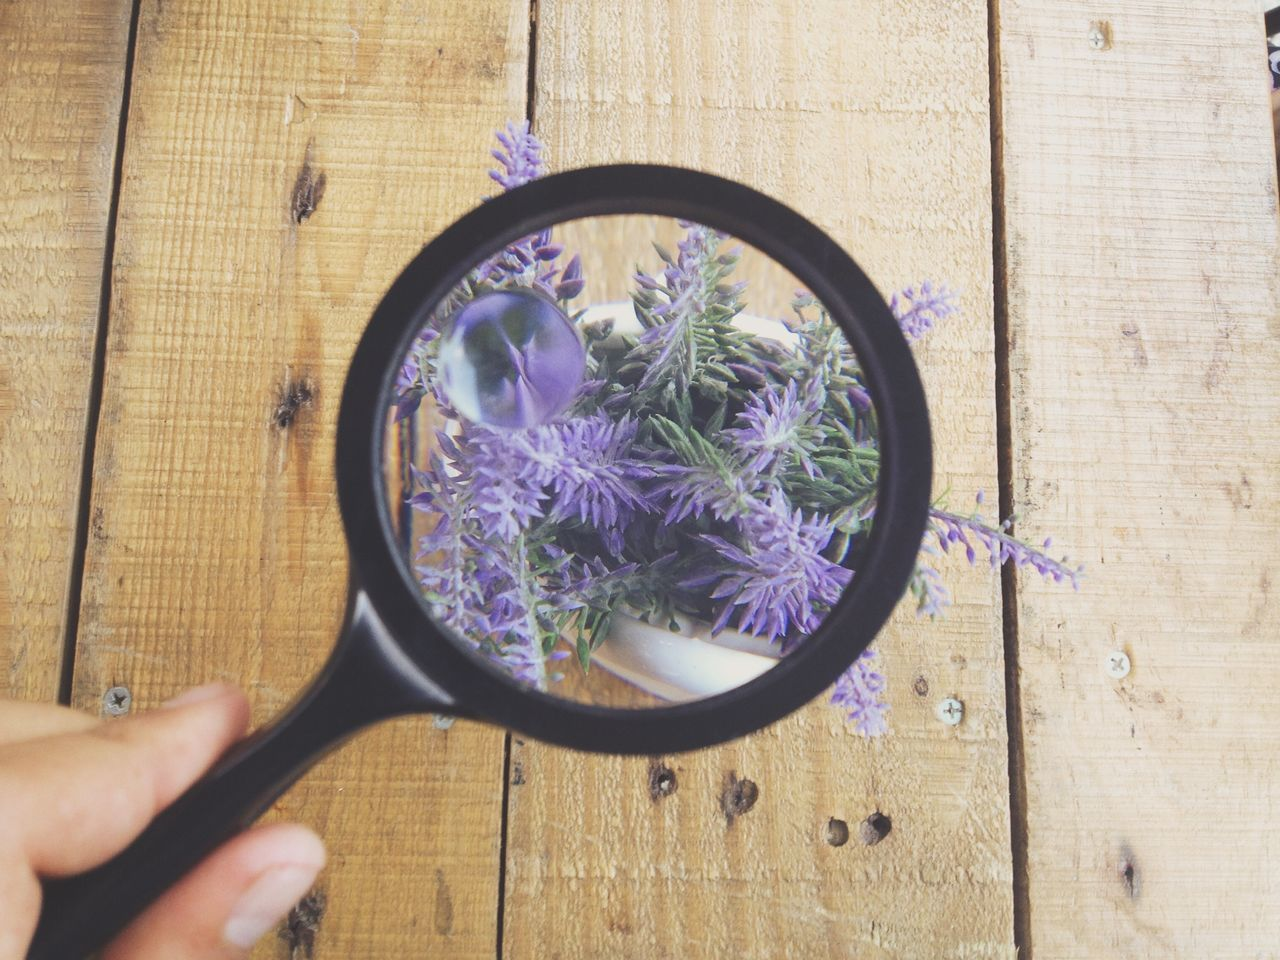 RePicture Growth focus Garden Nature Flowers Market Bestsellers June 2016 Bestsellers